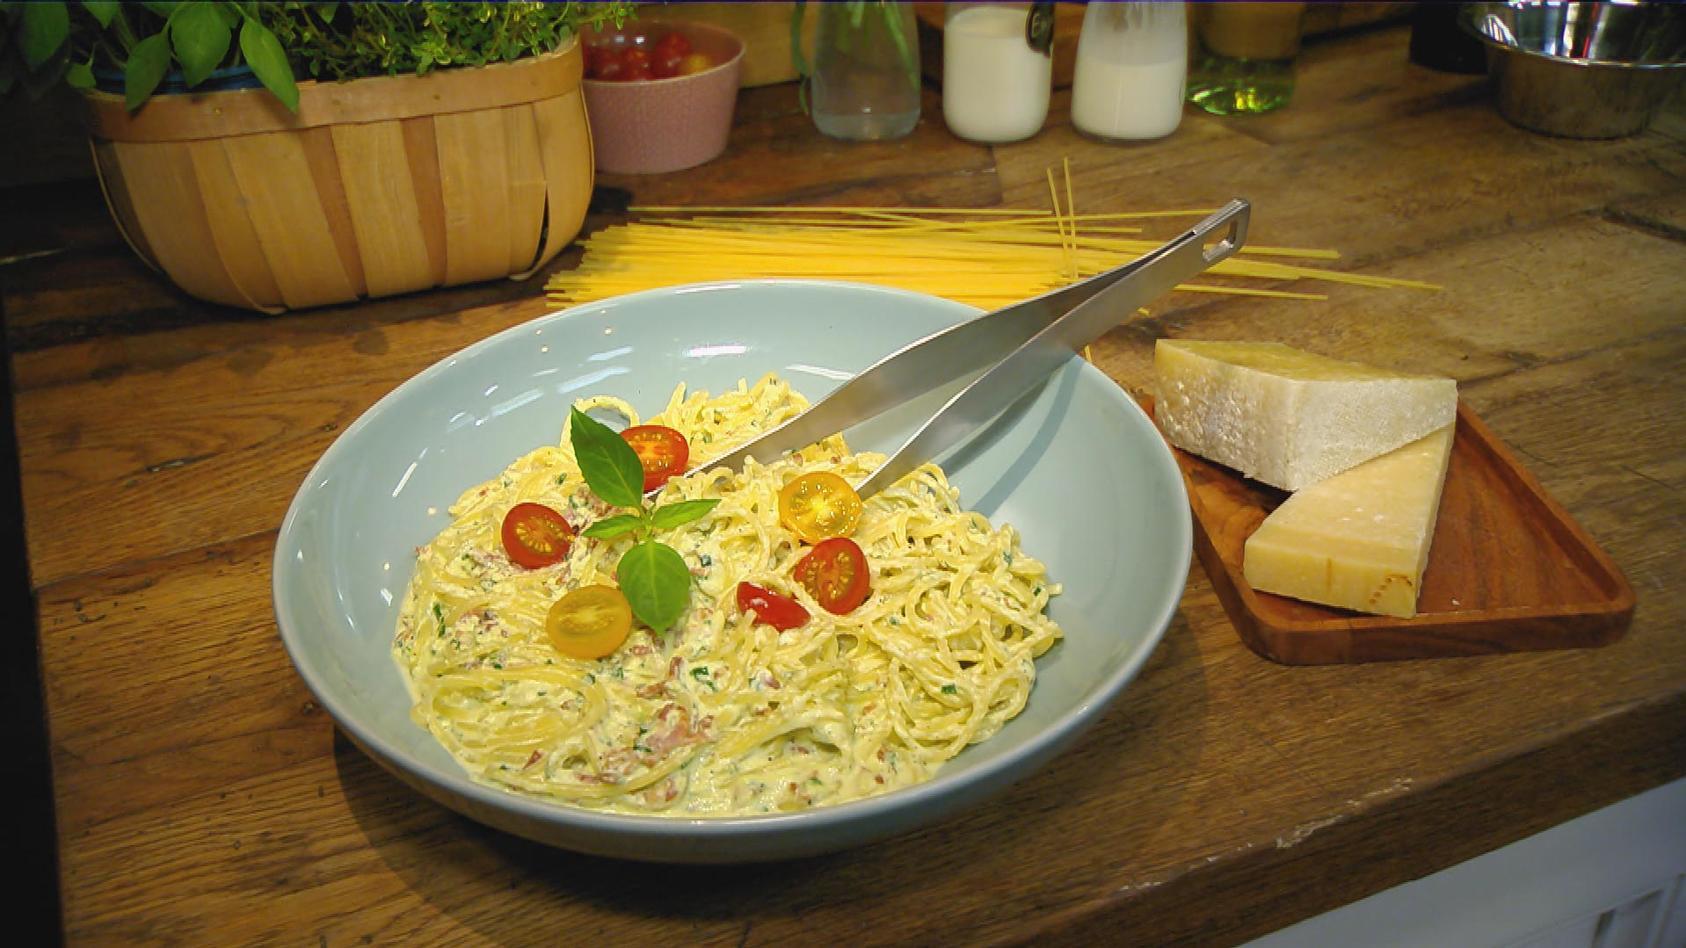 Heute gibt's Pasta. Basta!: Spaghetti mit Bärlauch-Carbonara